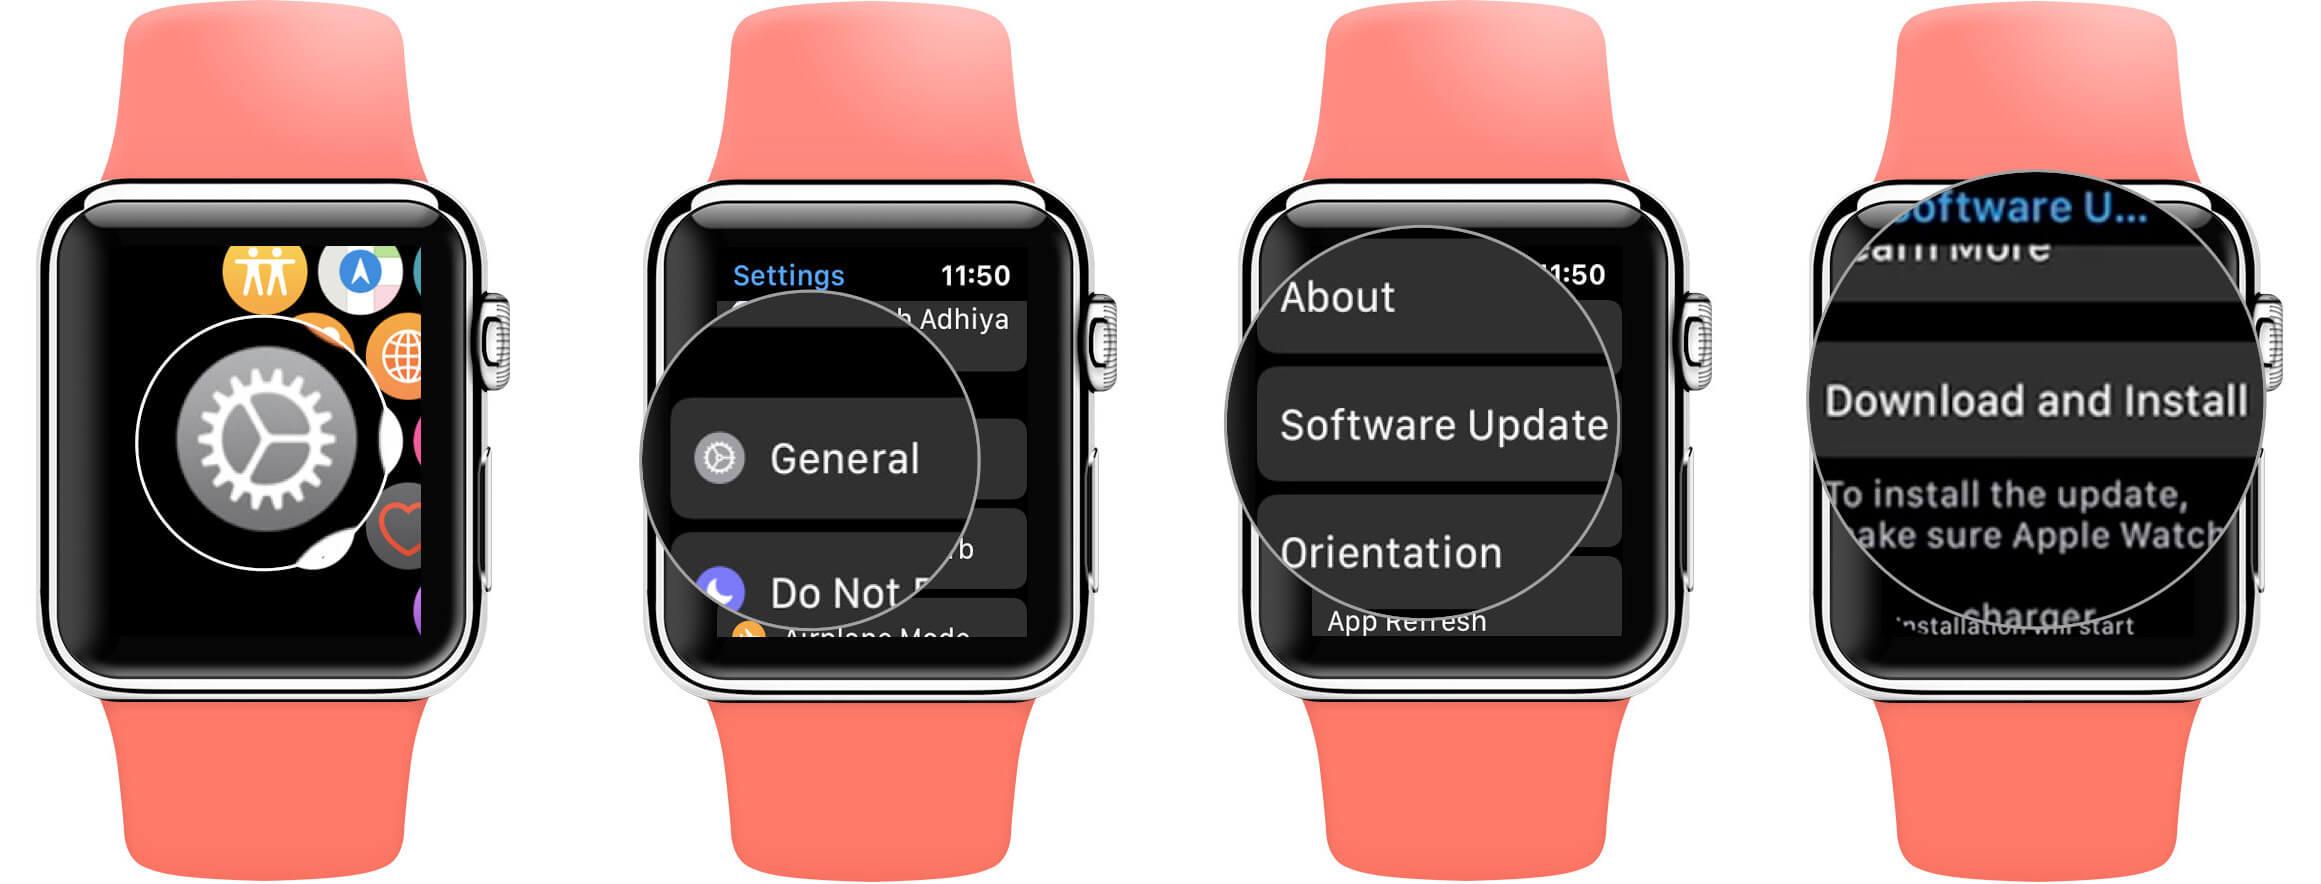 Update watchOS from Apple Watch Series 5